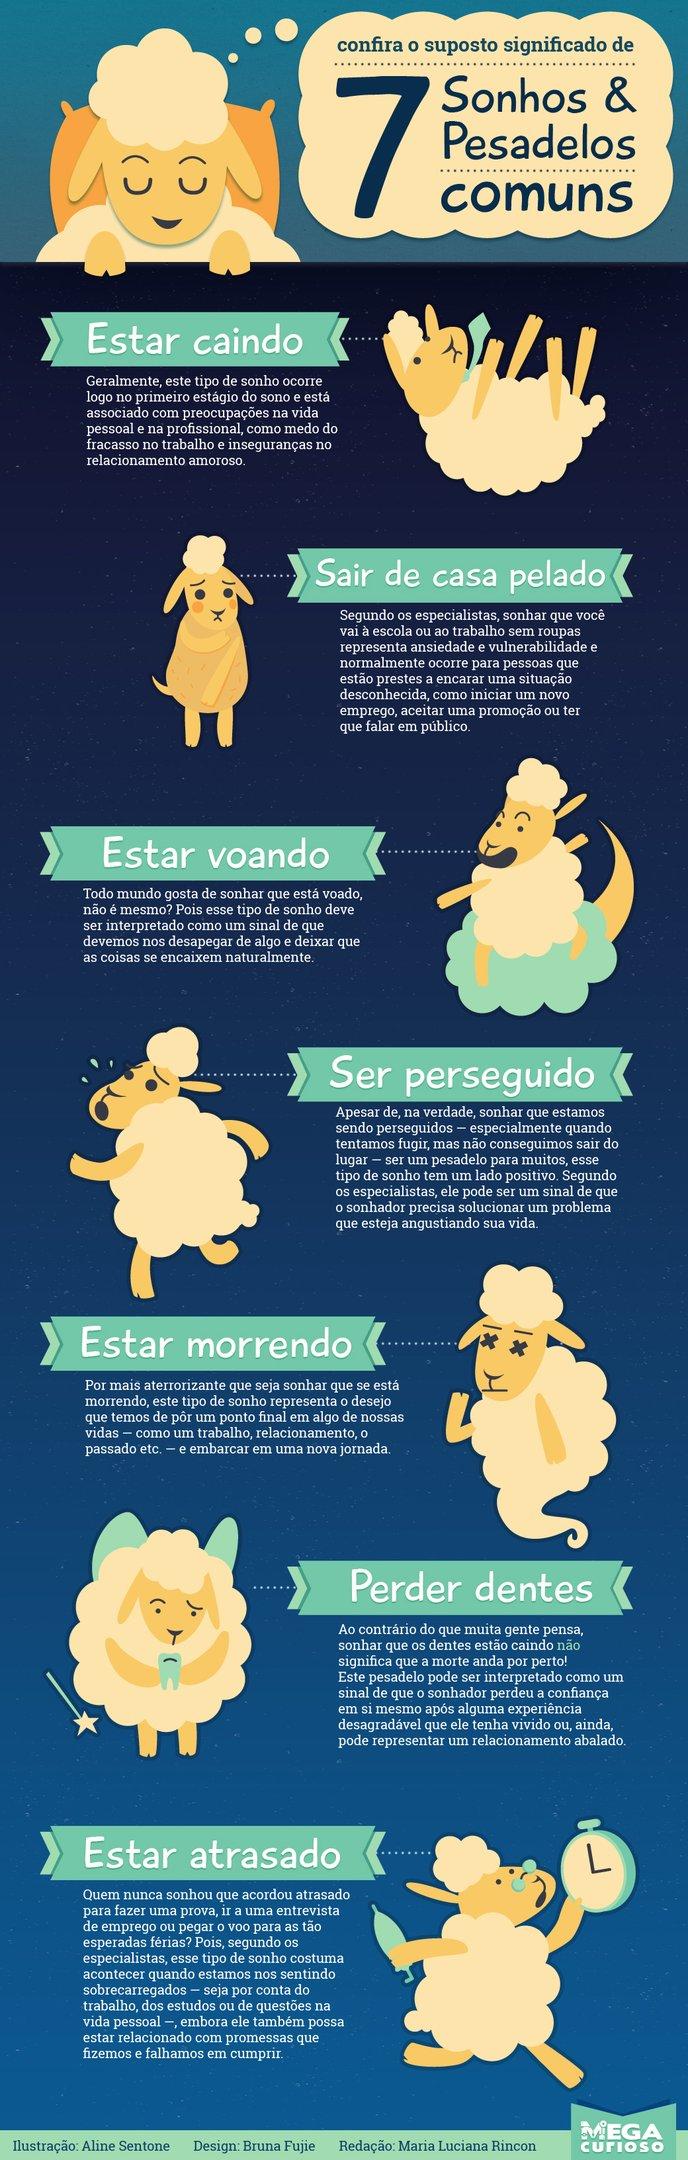 Confira o suposto significado de 7 sonhos e pesadelos comuns [infográfico]